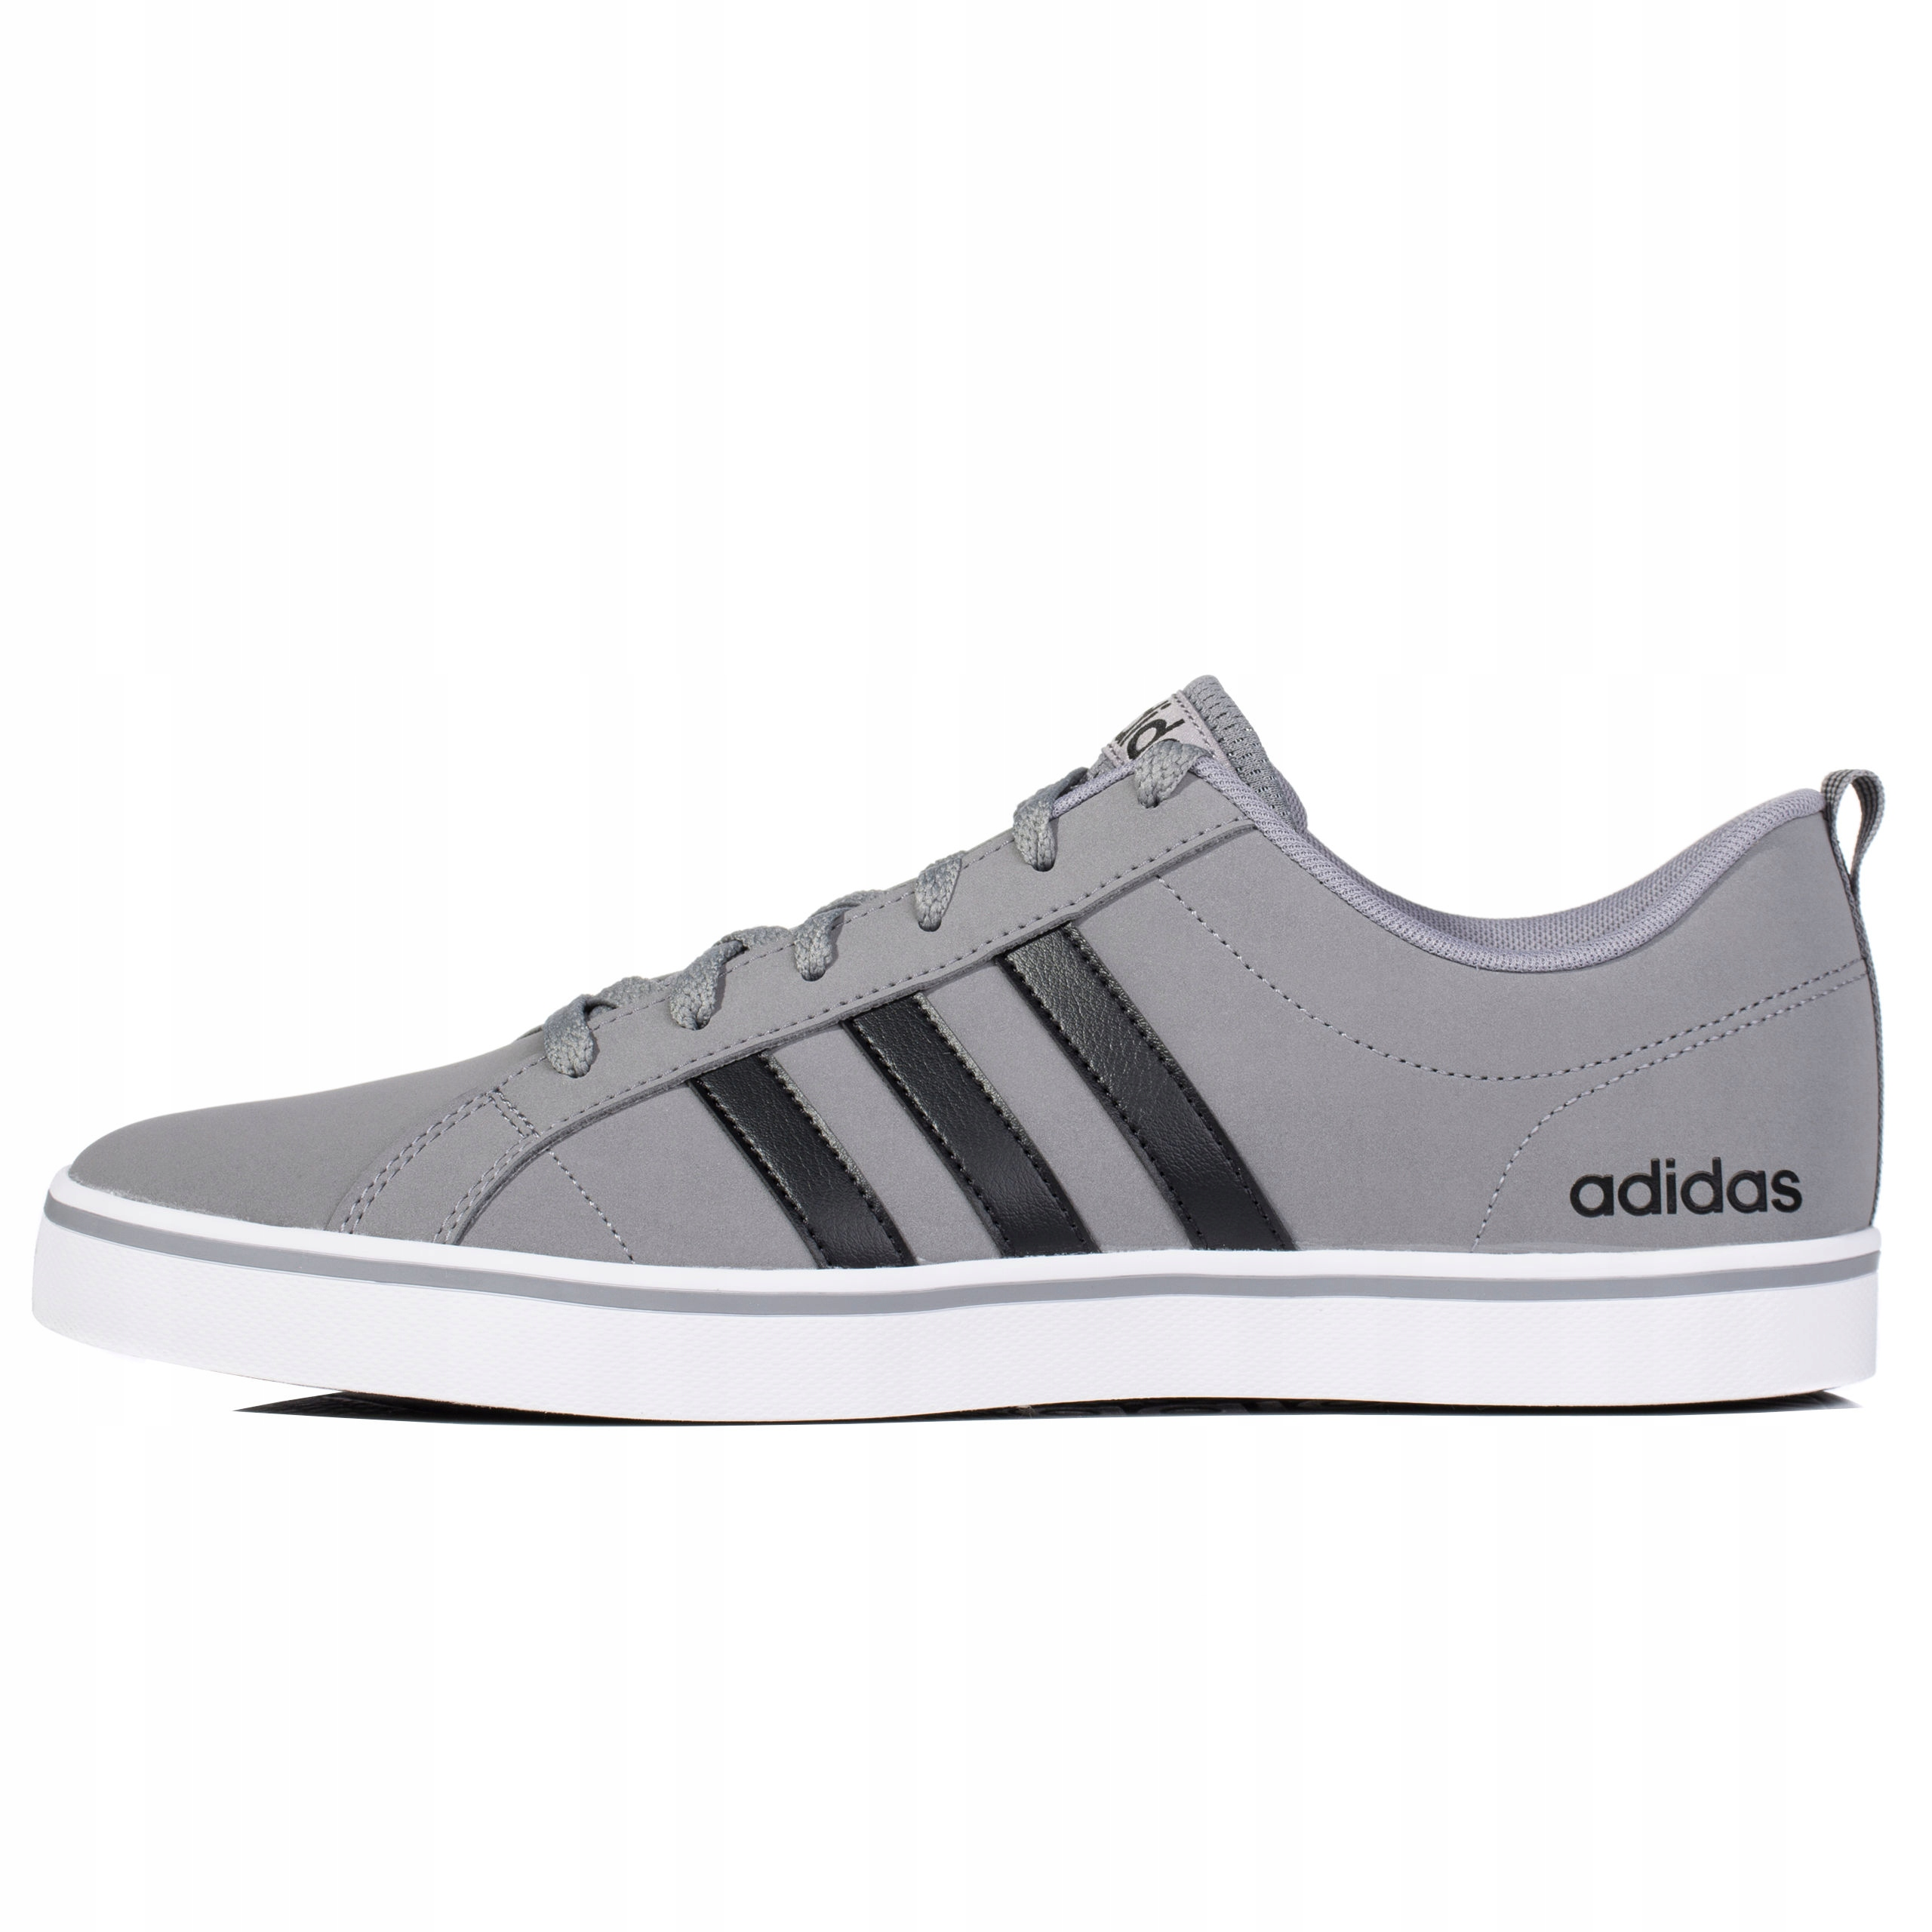 Buty męskie Adidas VS Pace B74318